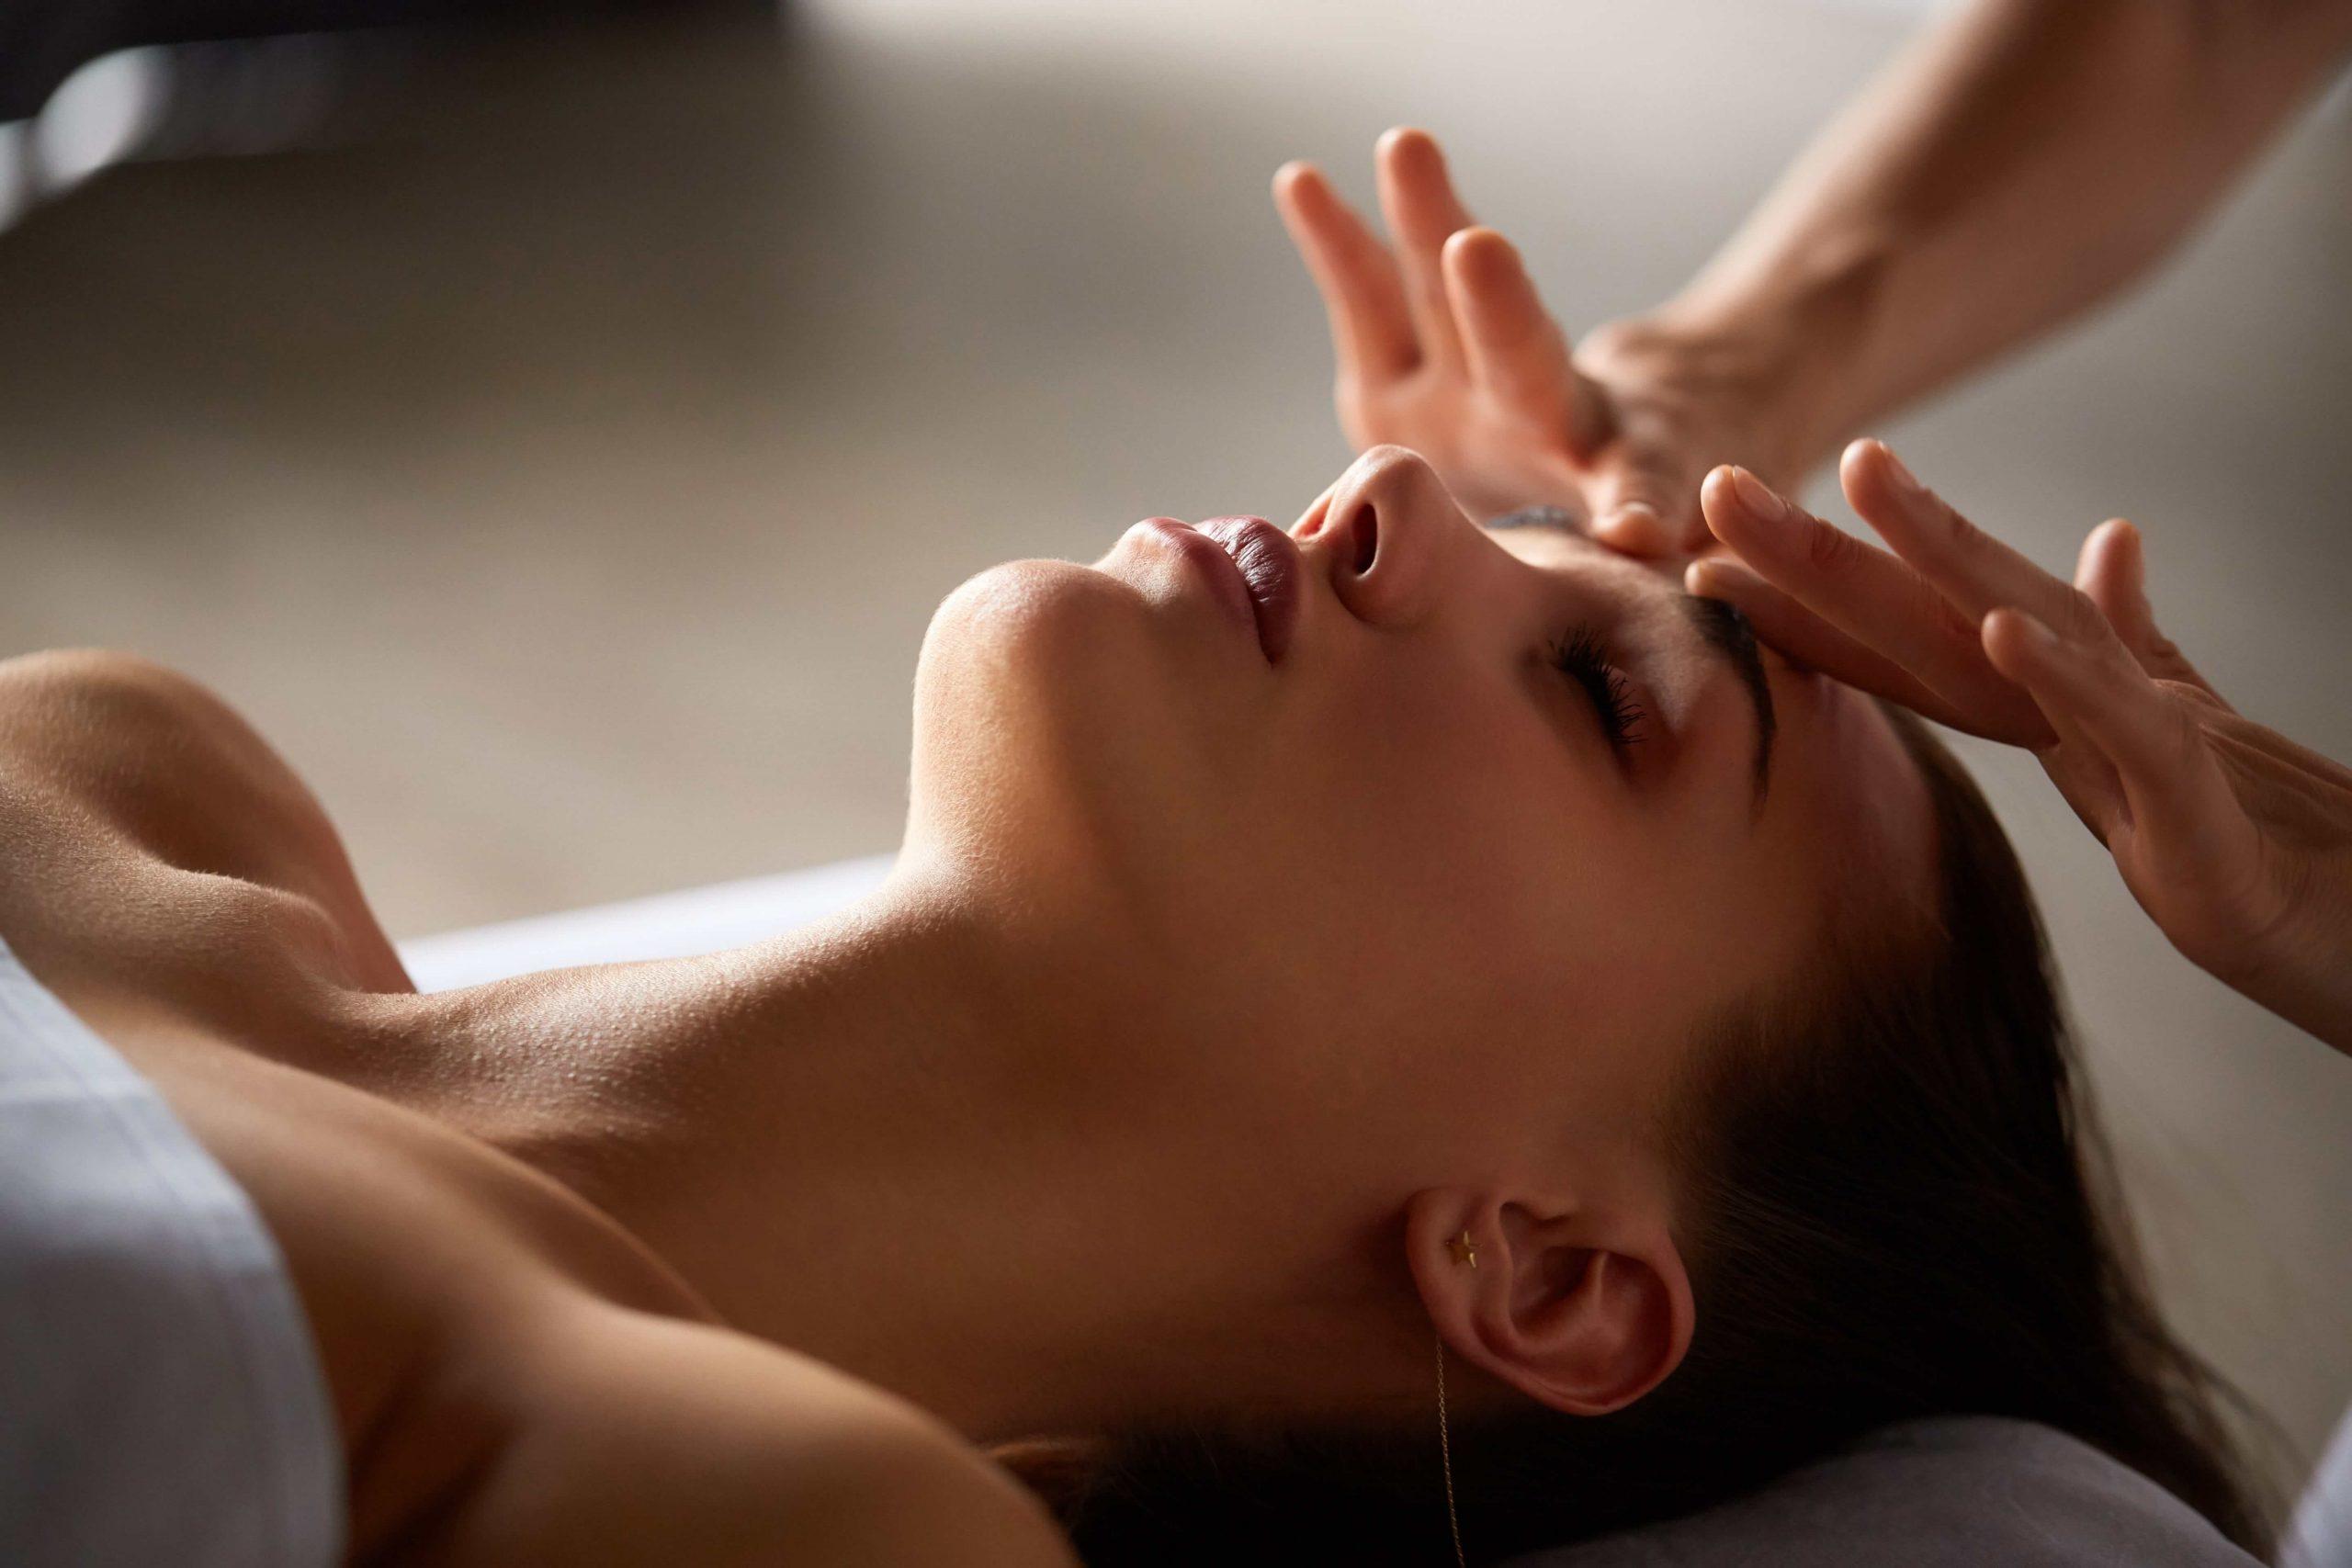 head-and-face-massage-in-spa-salon-J35U4ZQ-min